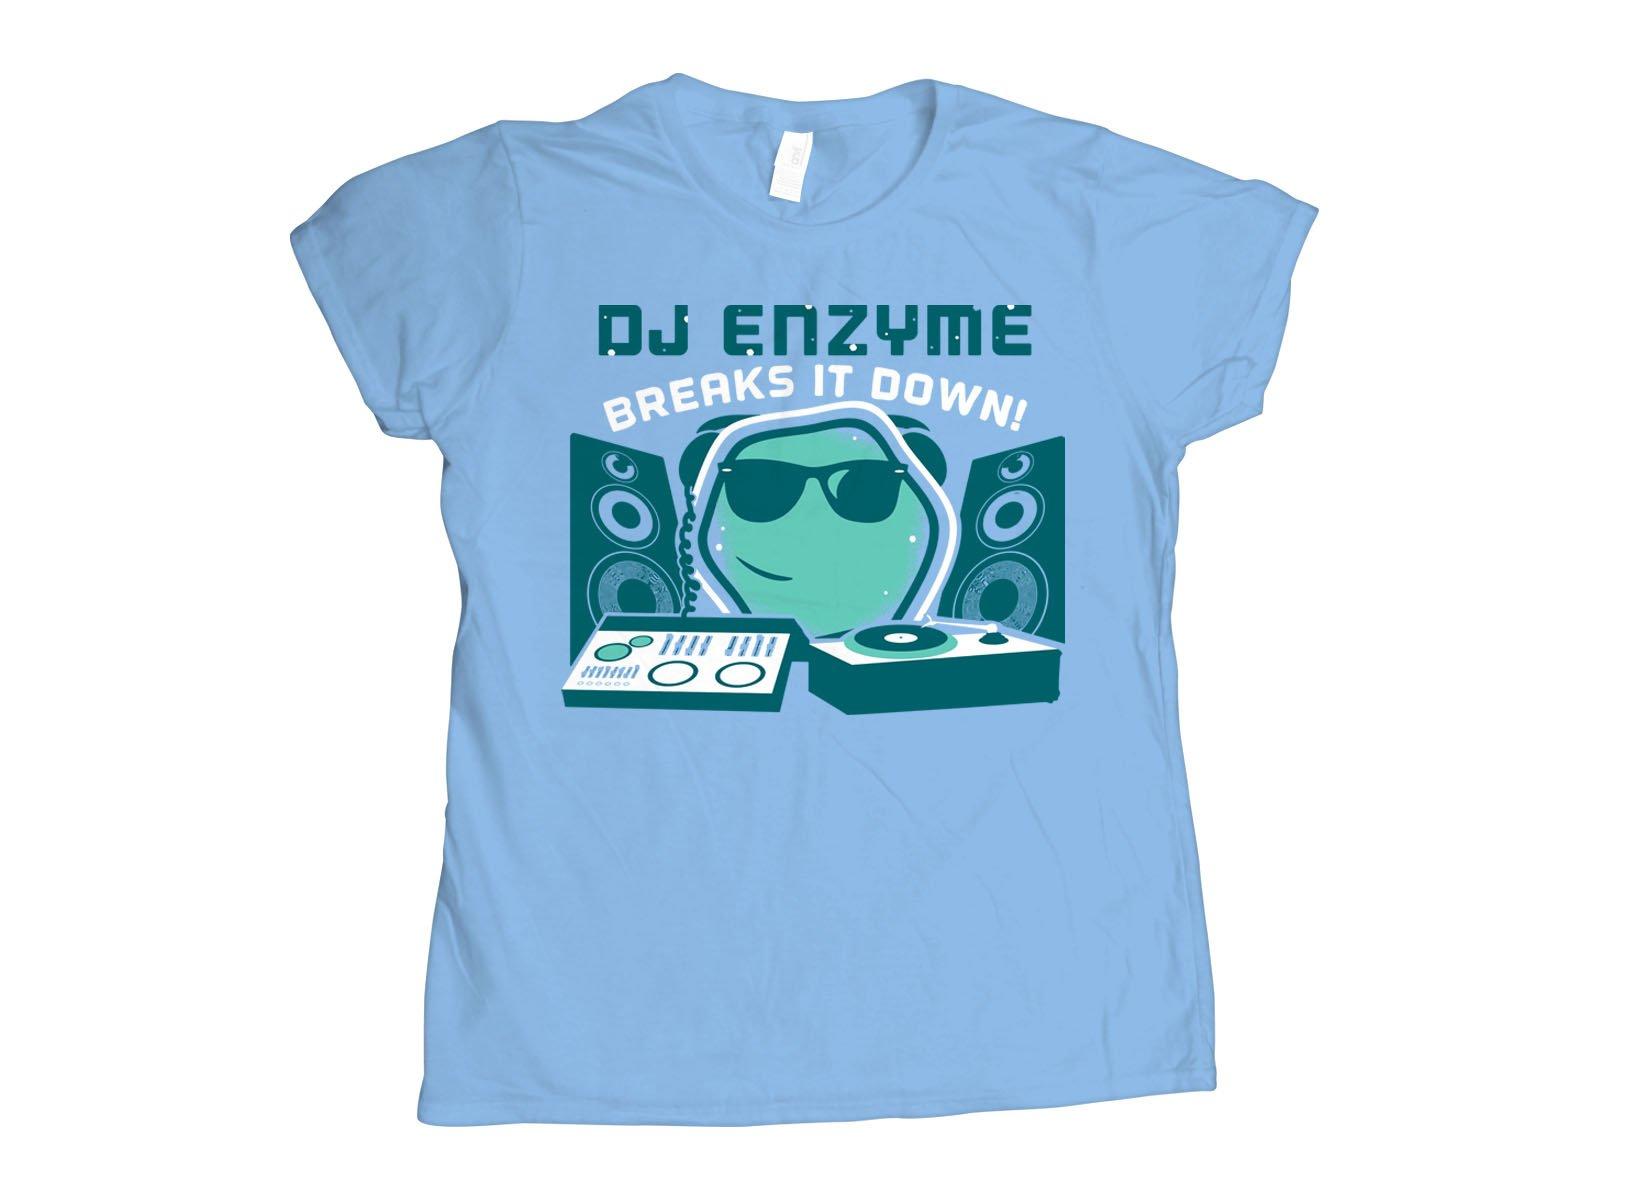 DJ Enzyme on Womens T-Shirt